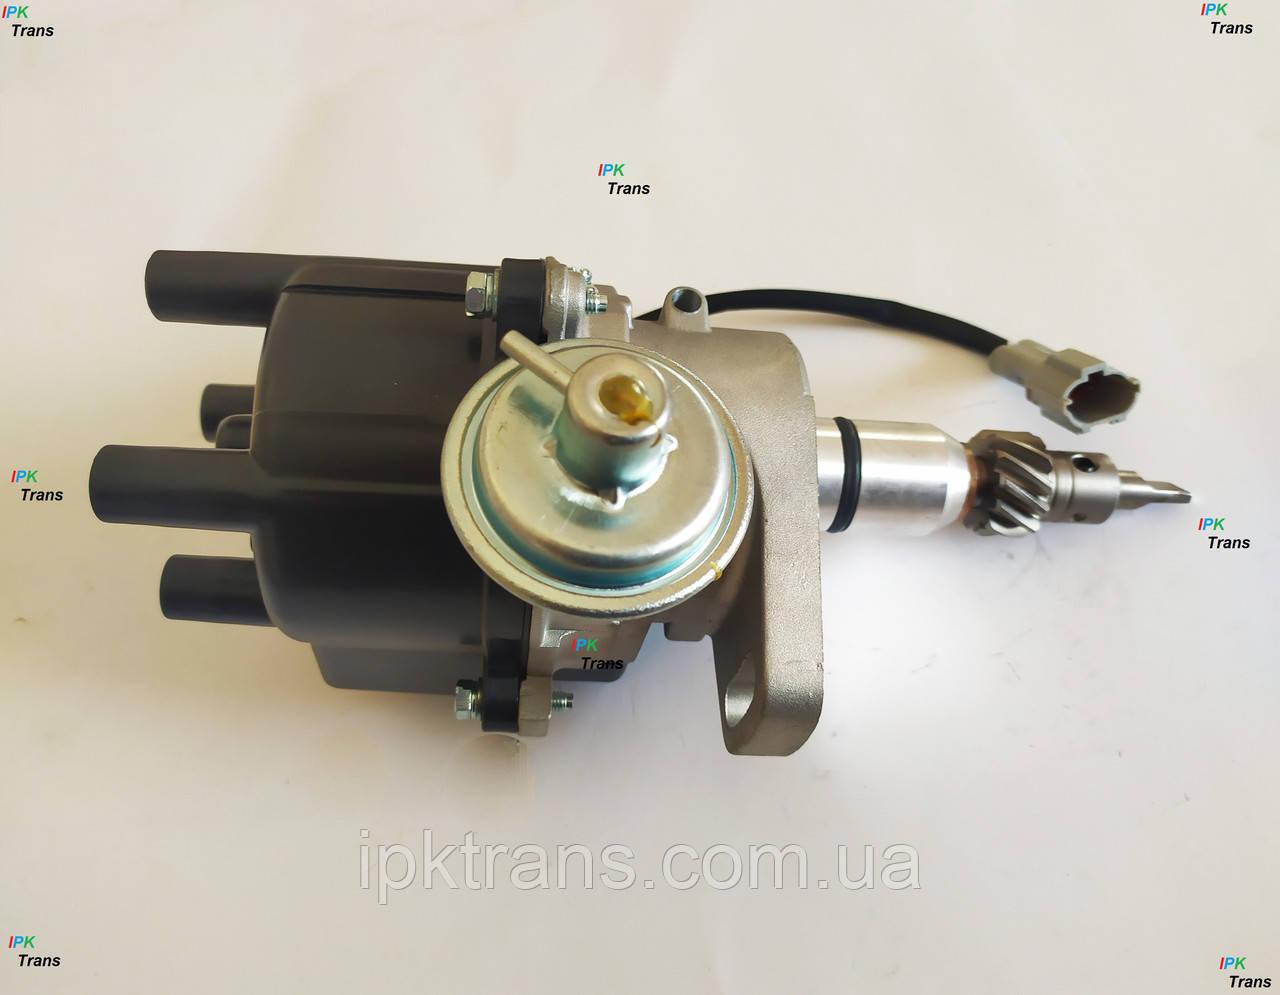 Трамблер двигателя TOYOTA 5K (4290 грн) 19030-78122-71 / 190307812271